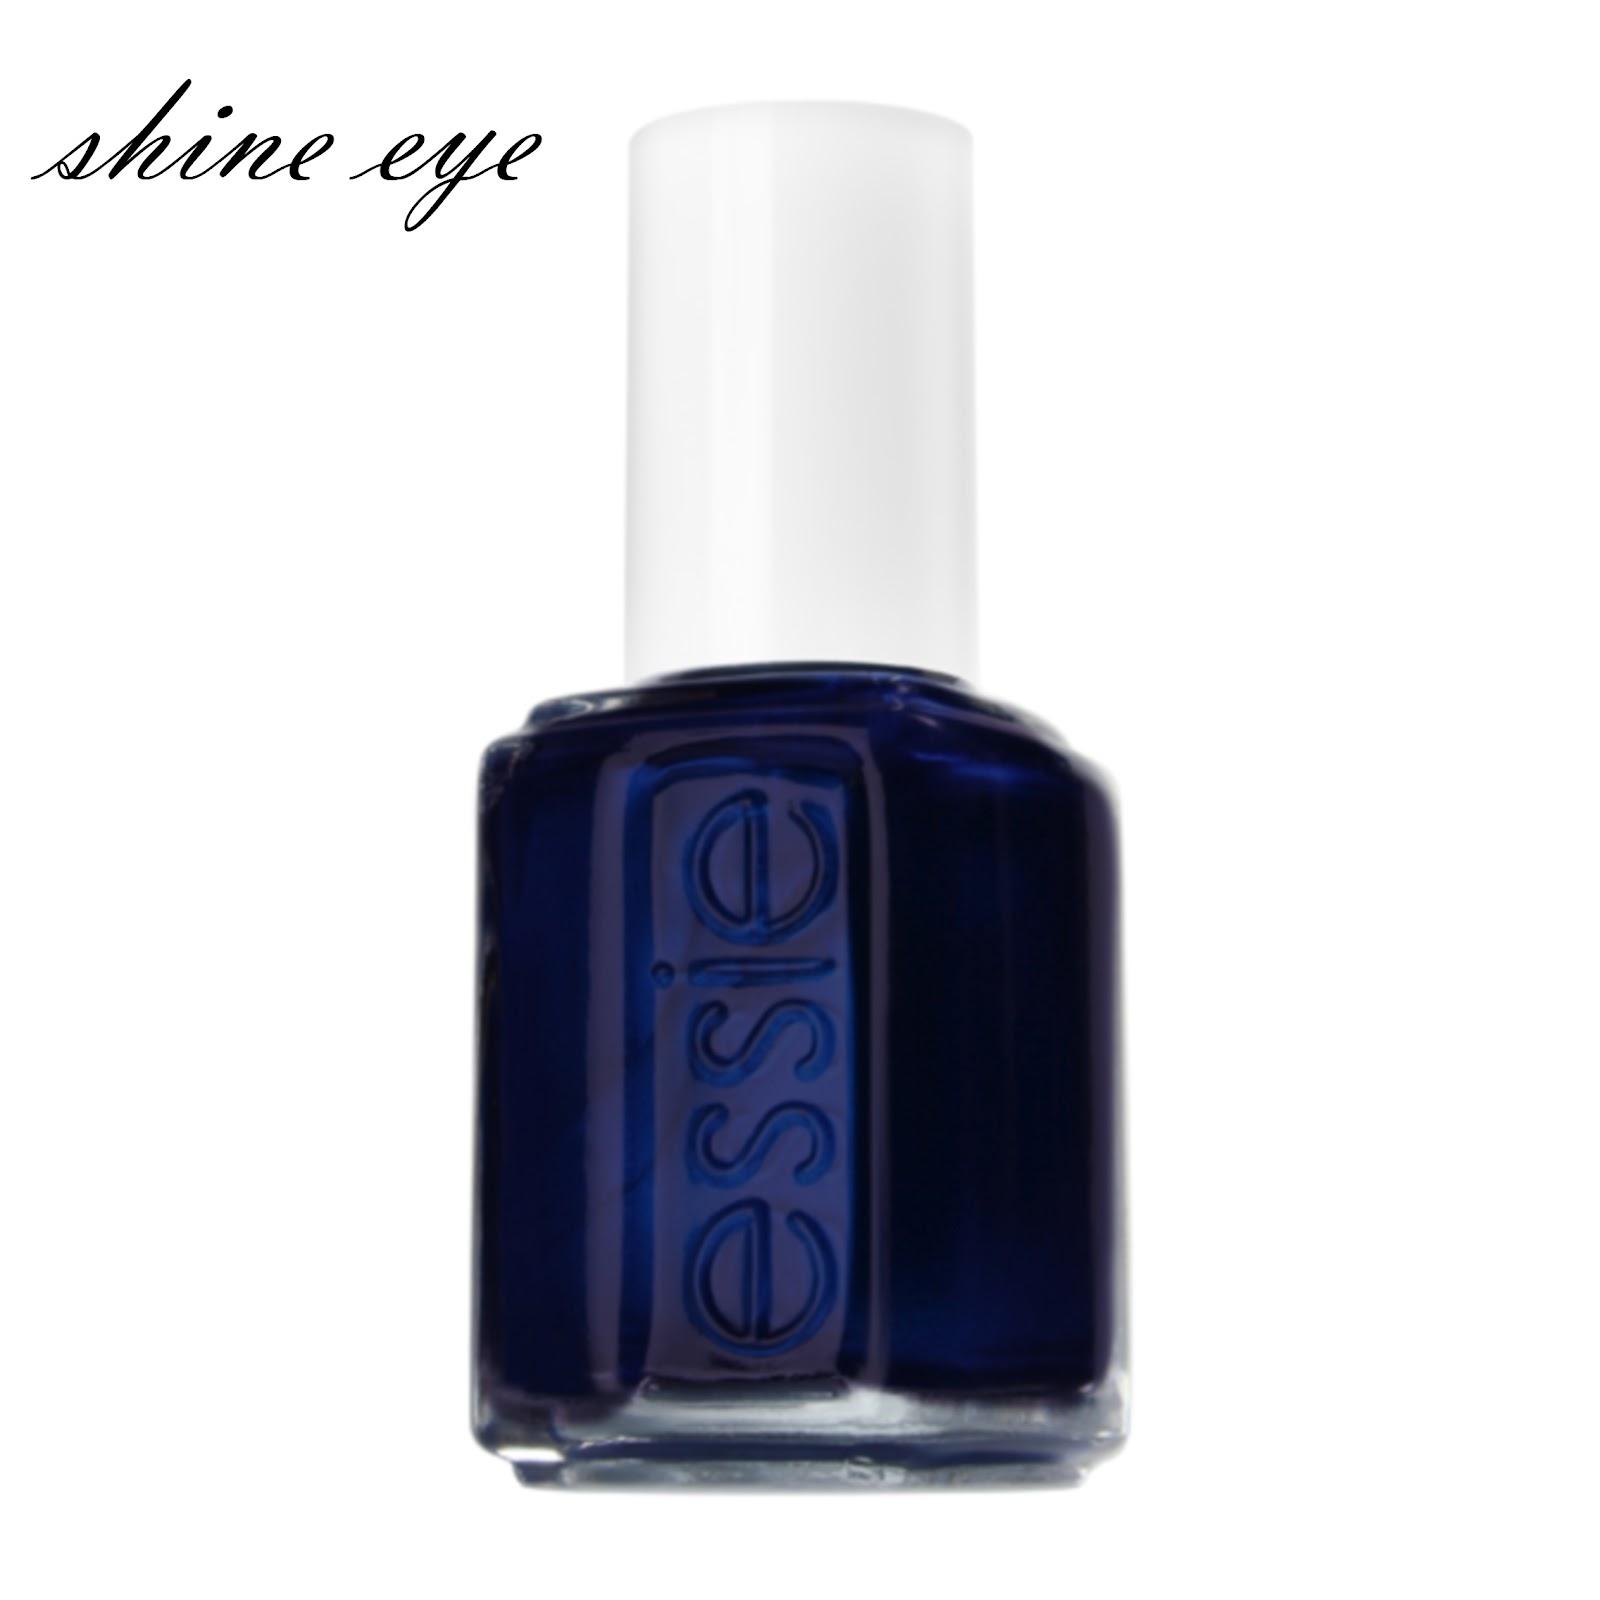 Shine Eye's Shiny Nails: Essie Midnite Cami